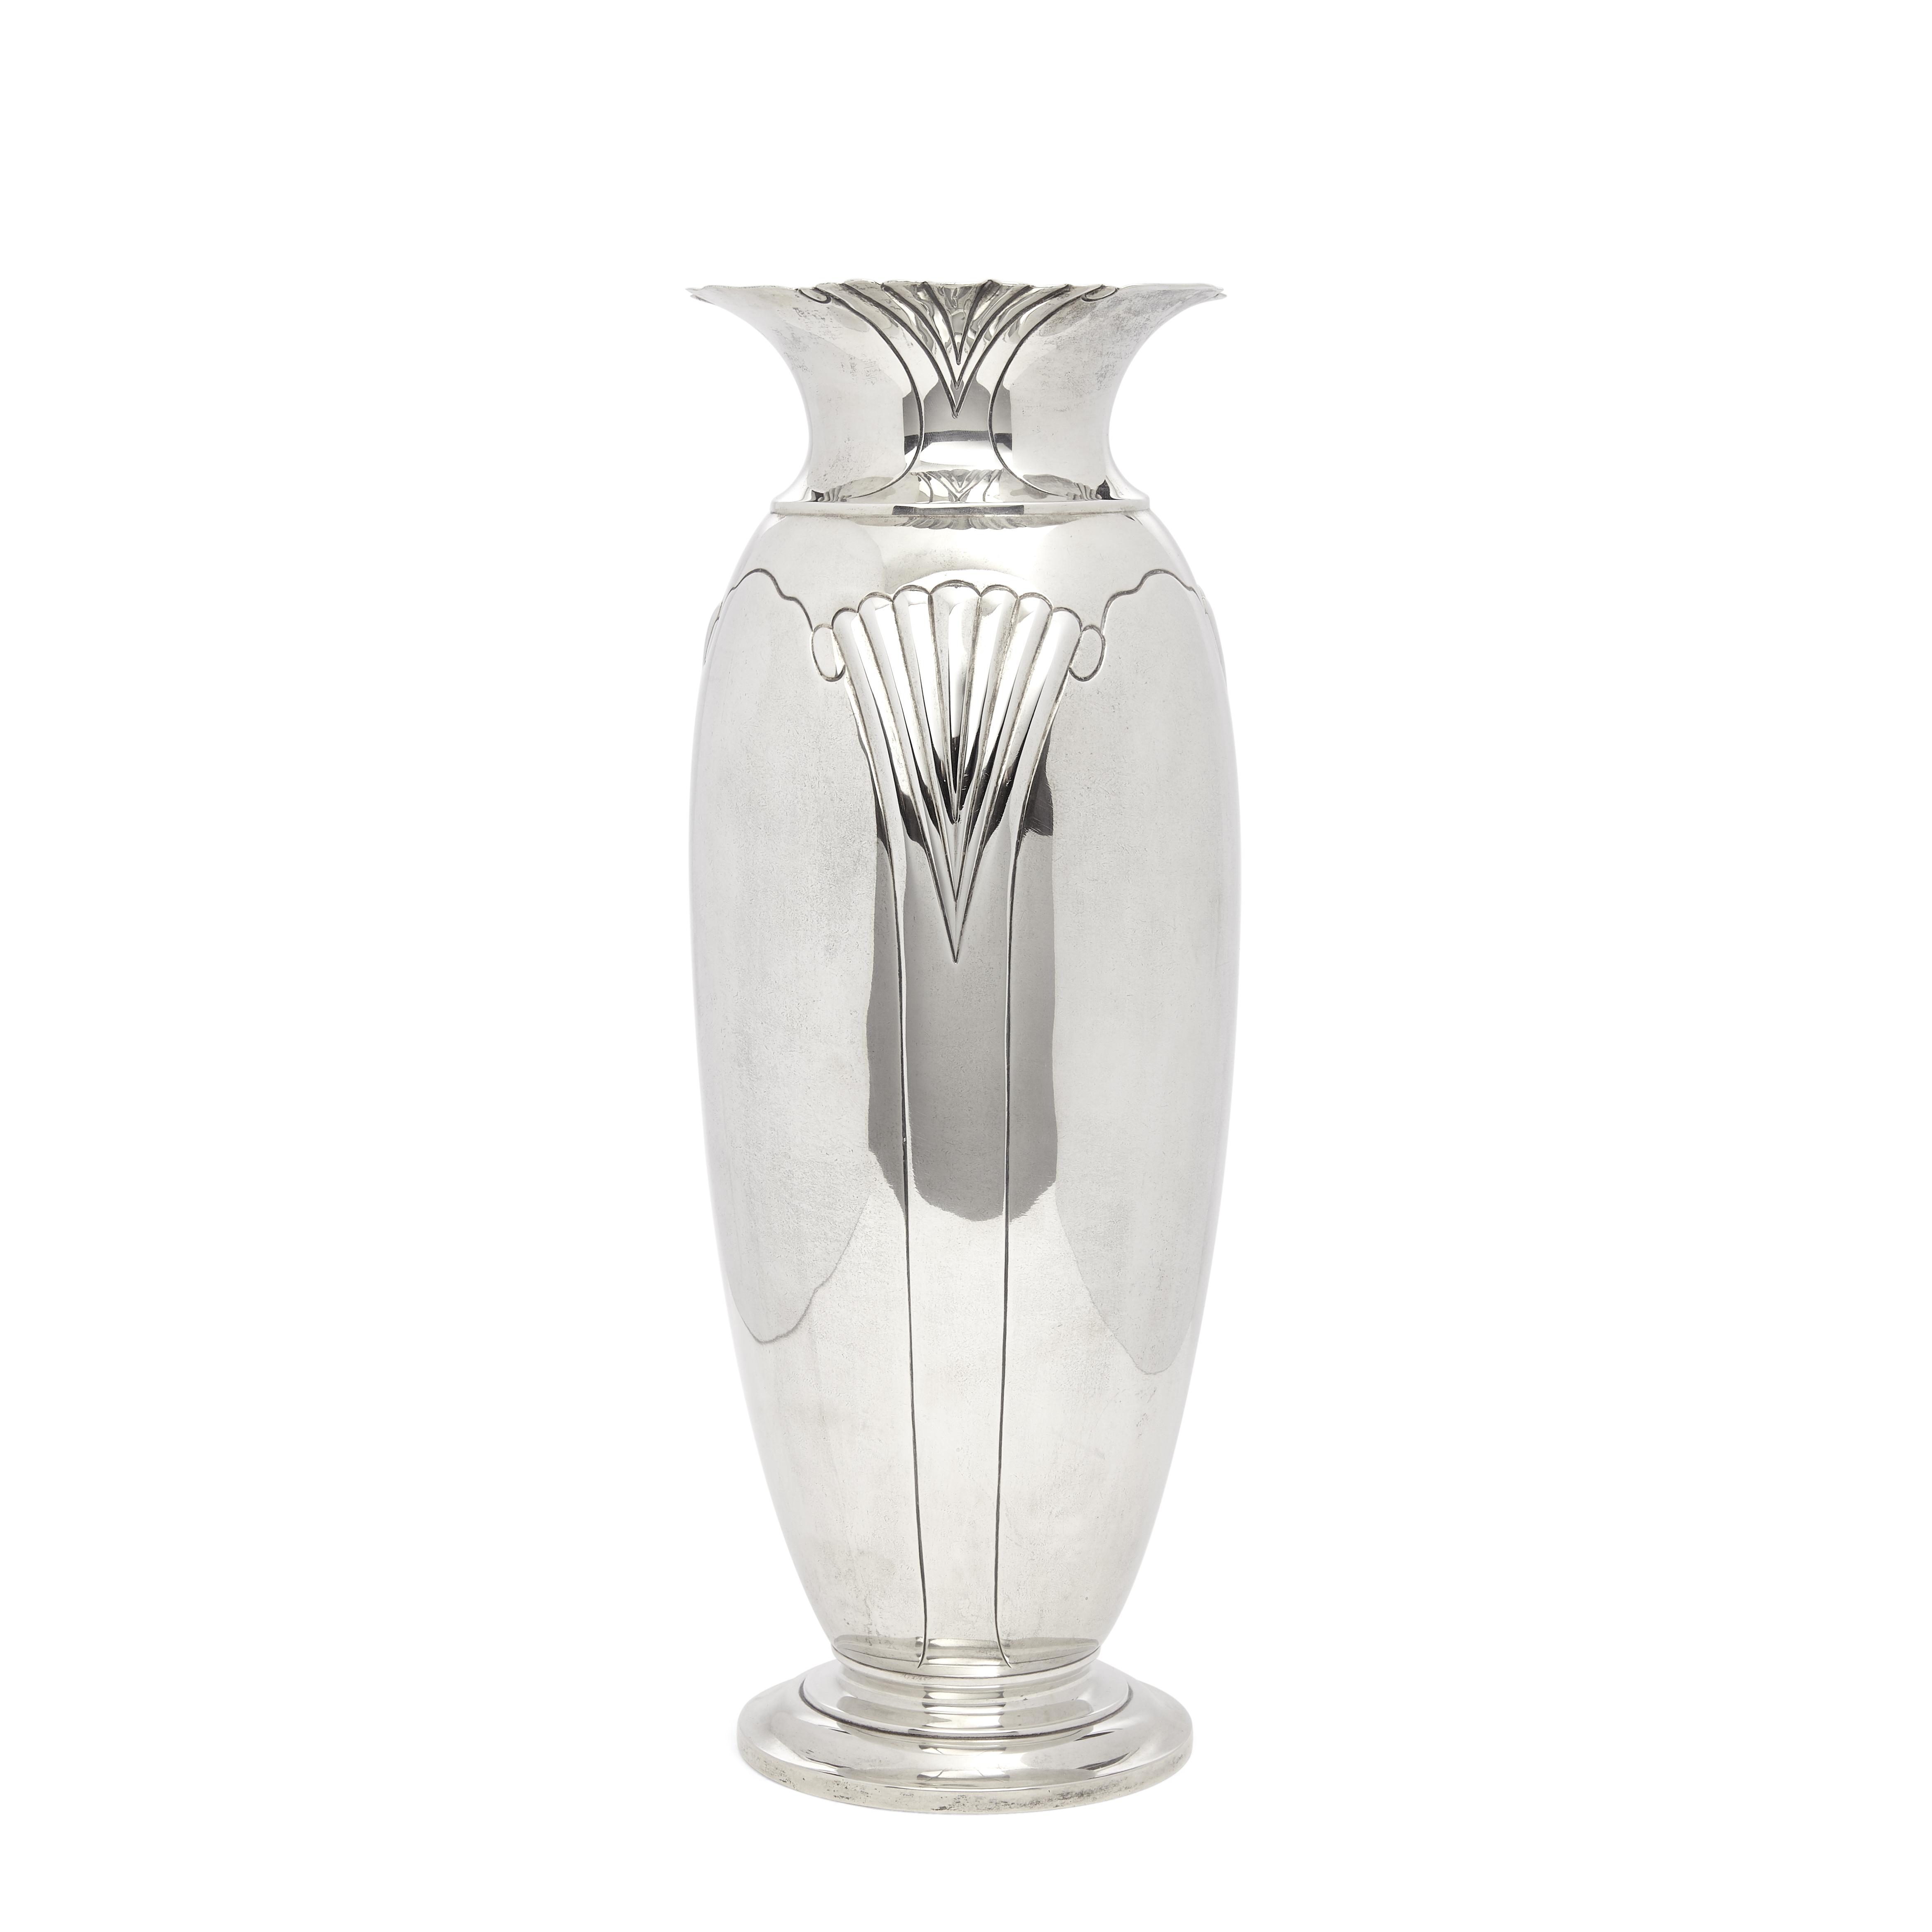 An American sterling silver art deco vase by Tuttle Silversmiths, Boston, MA, circa 1938